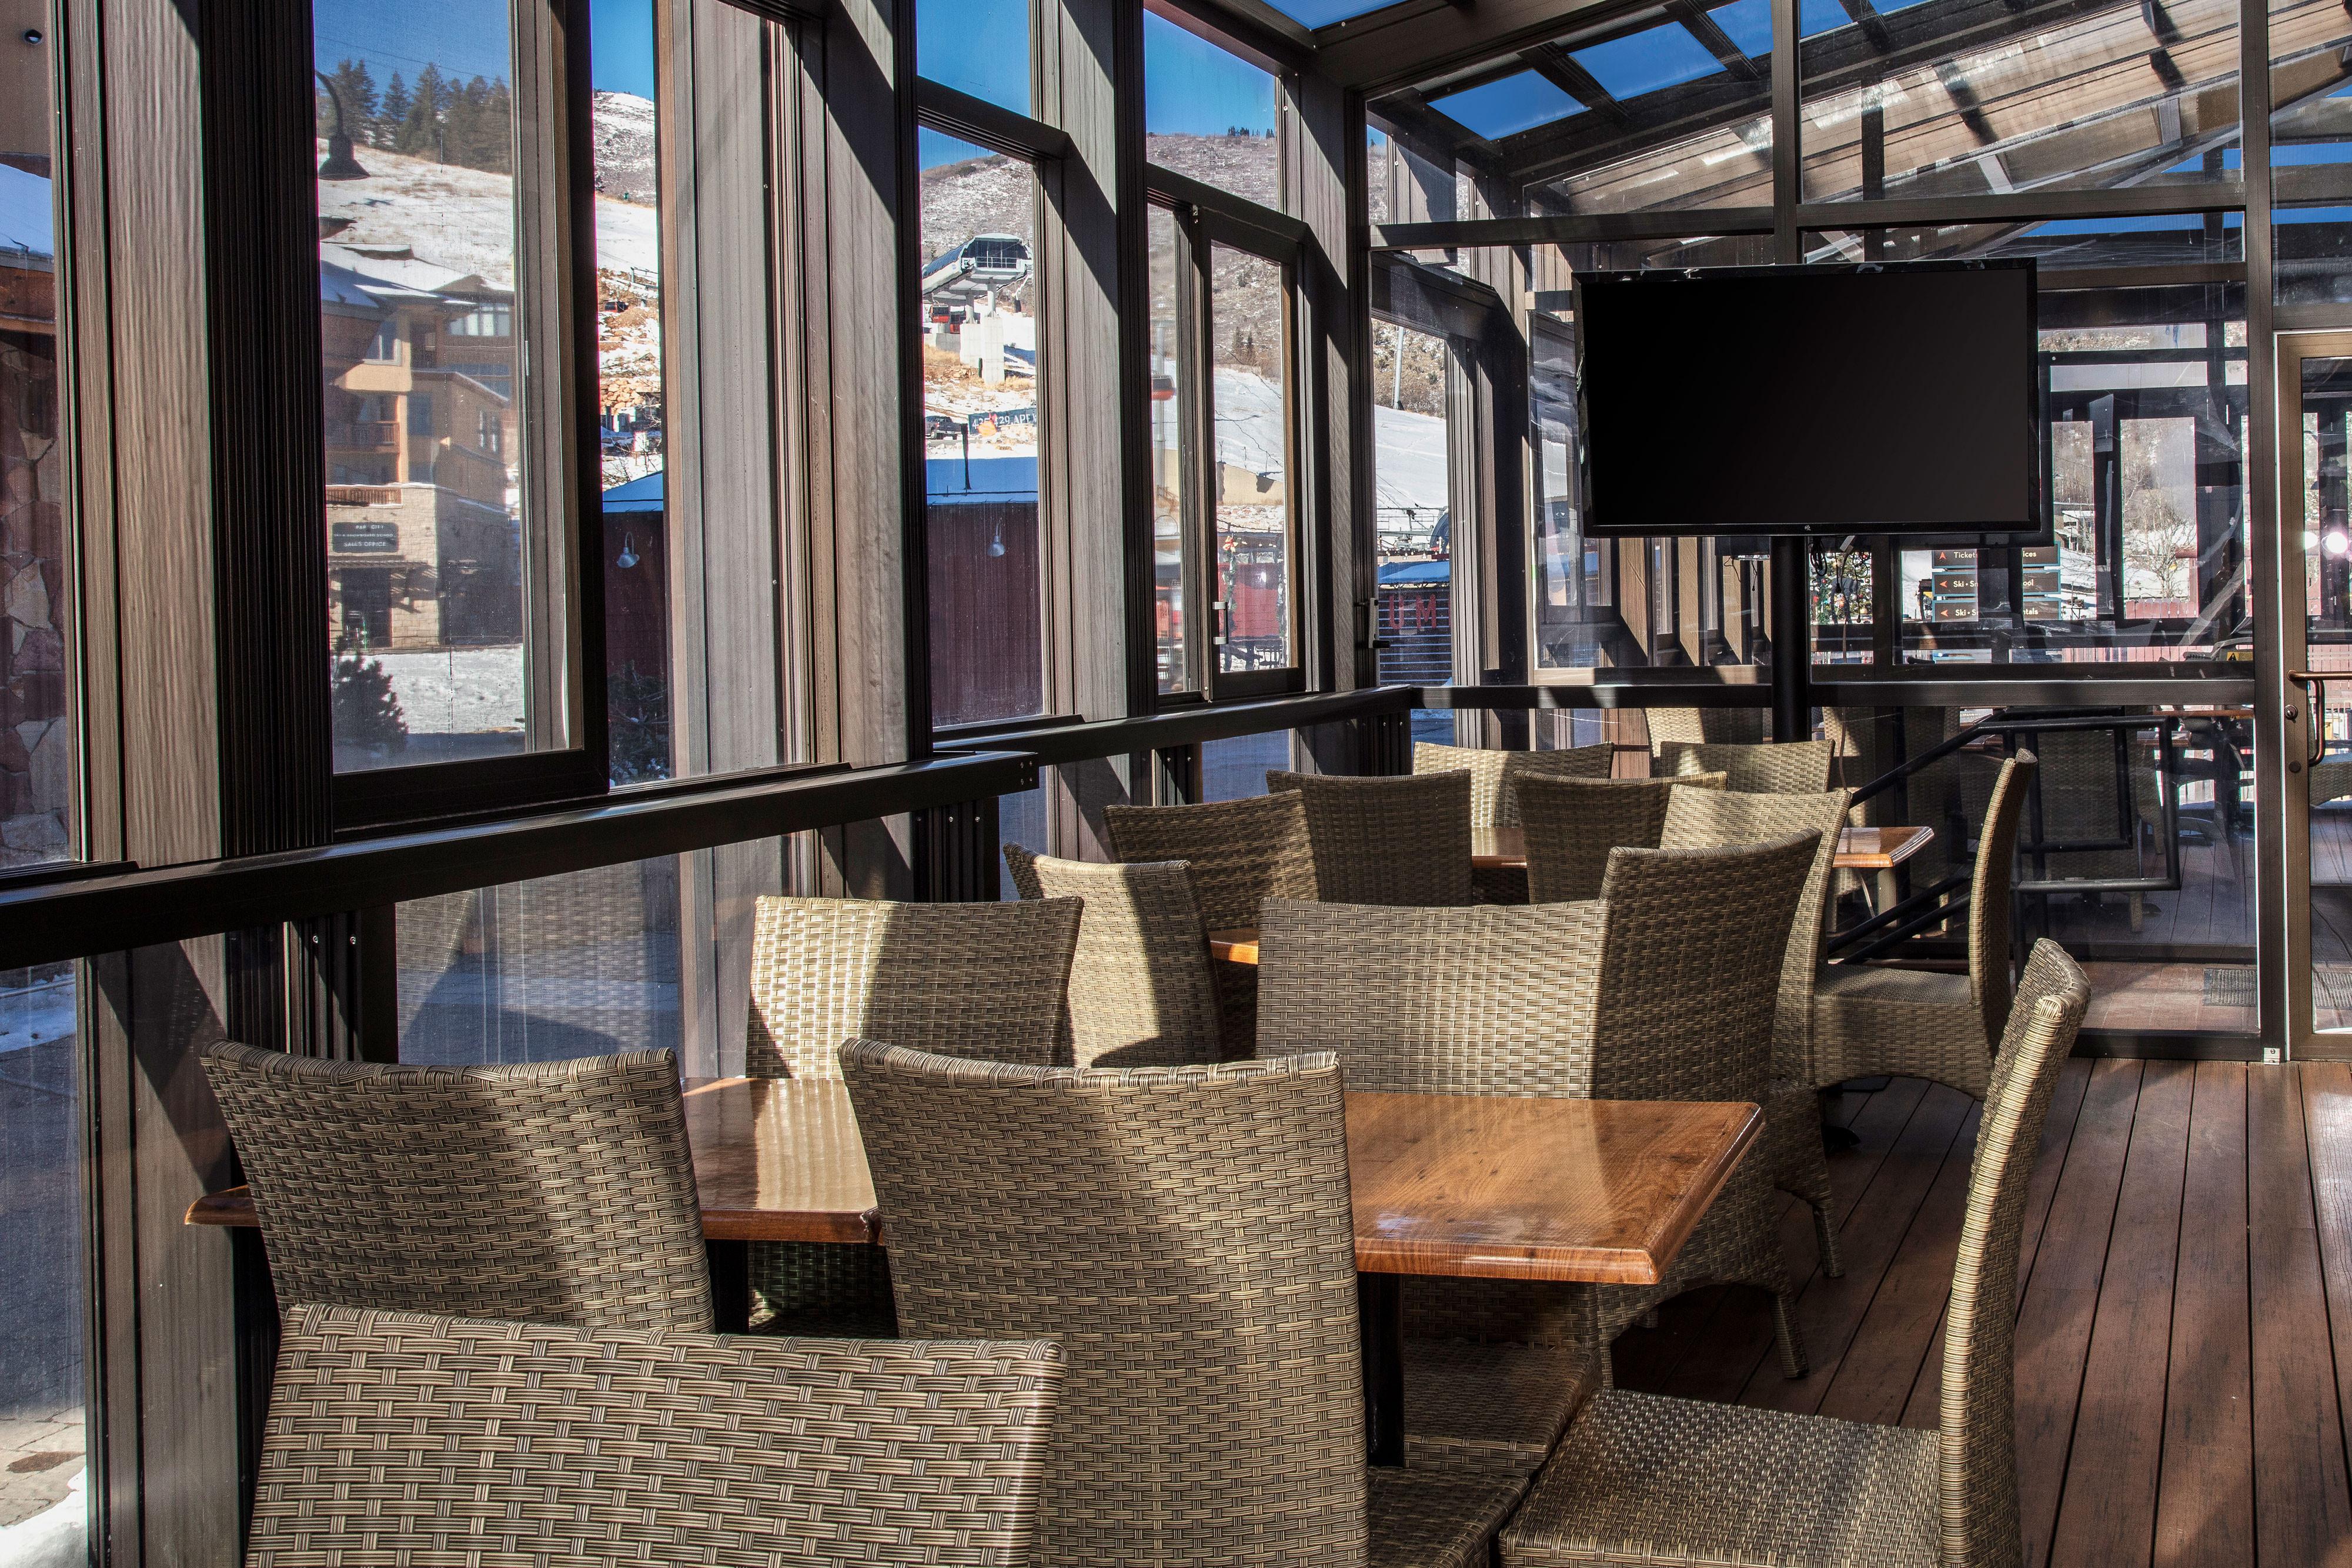 Restaurant Seating at Drafts Burger Bar in Park City Utah   Westgate Park City Resort & Spa   Westgate Resorts Dining